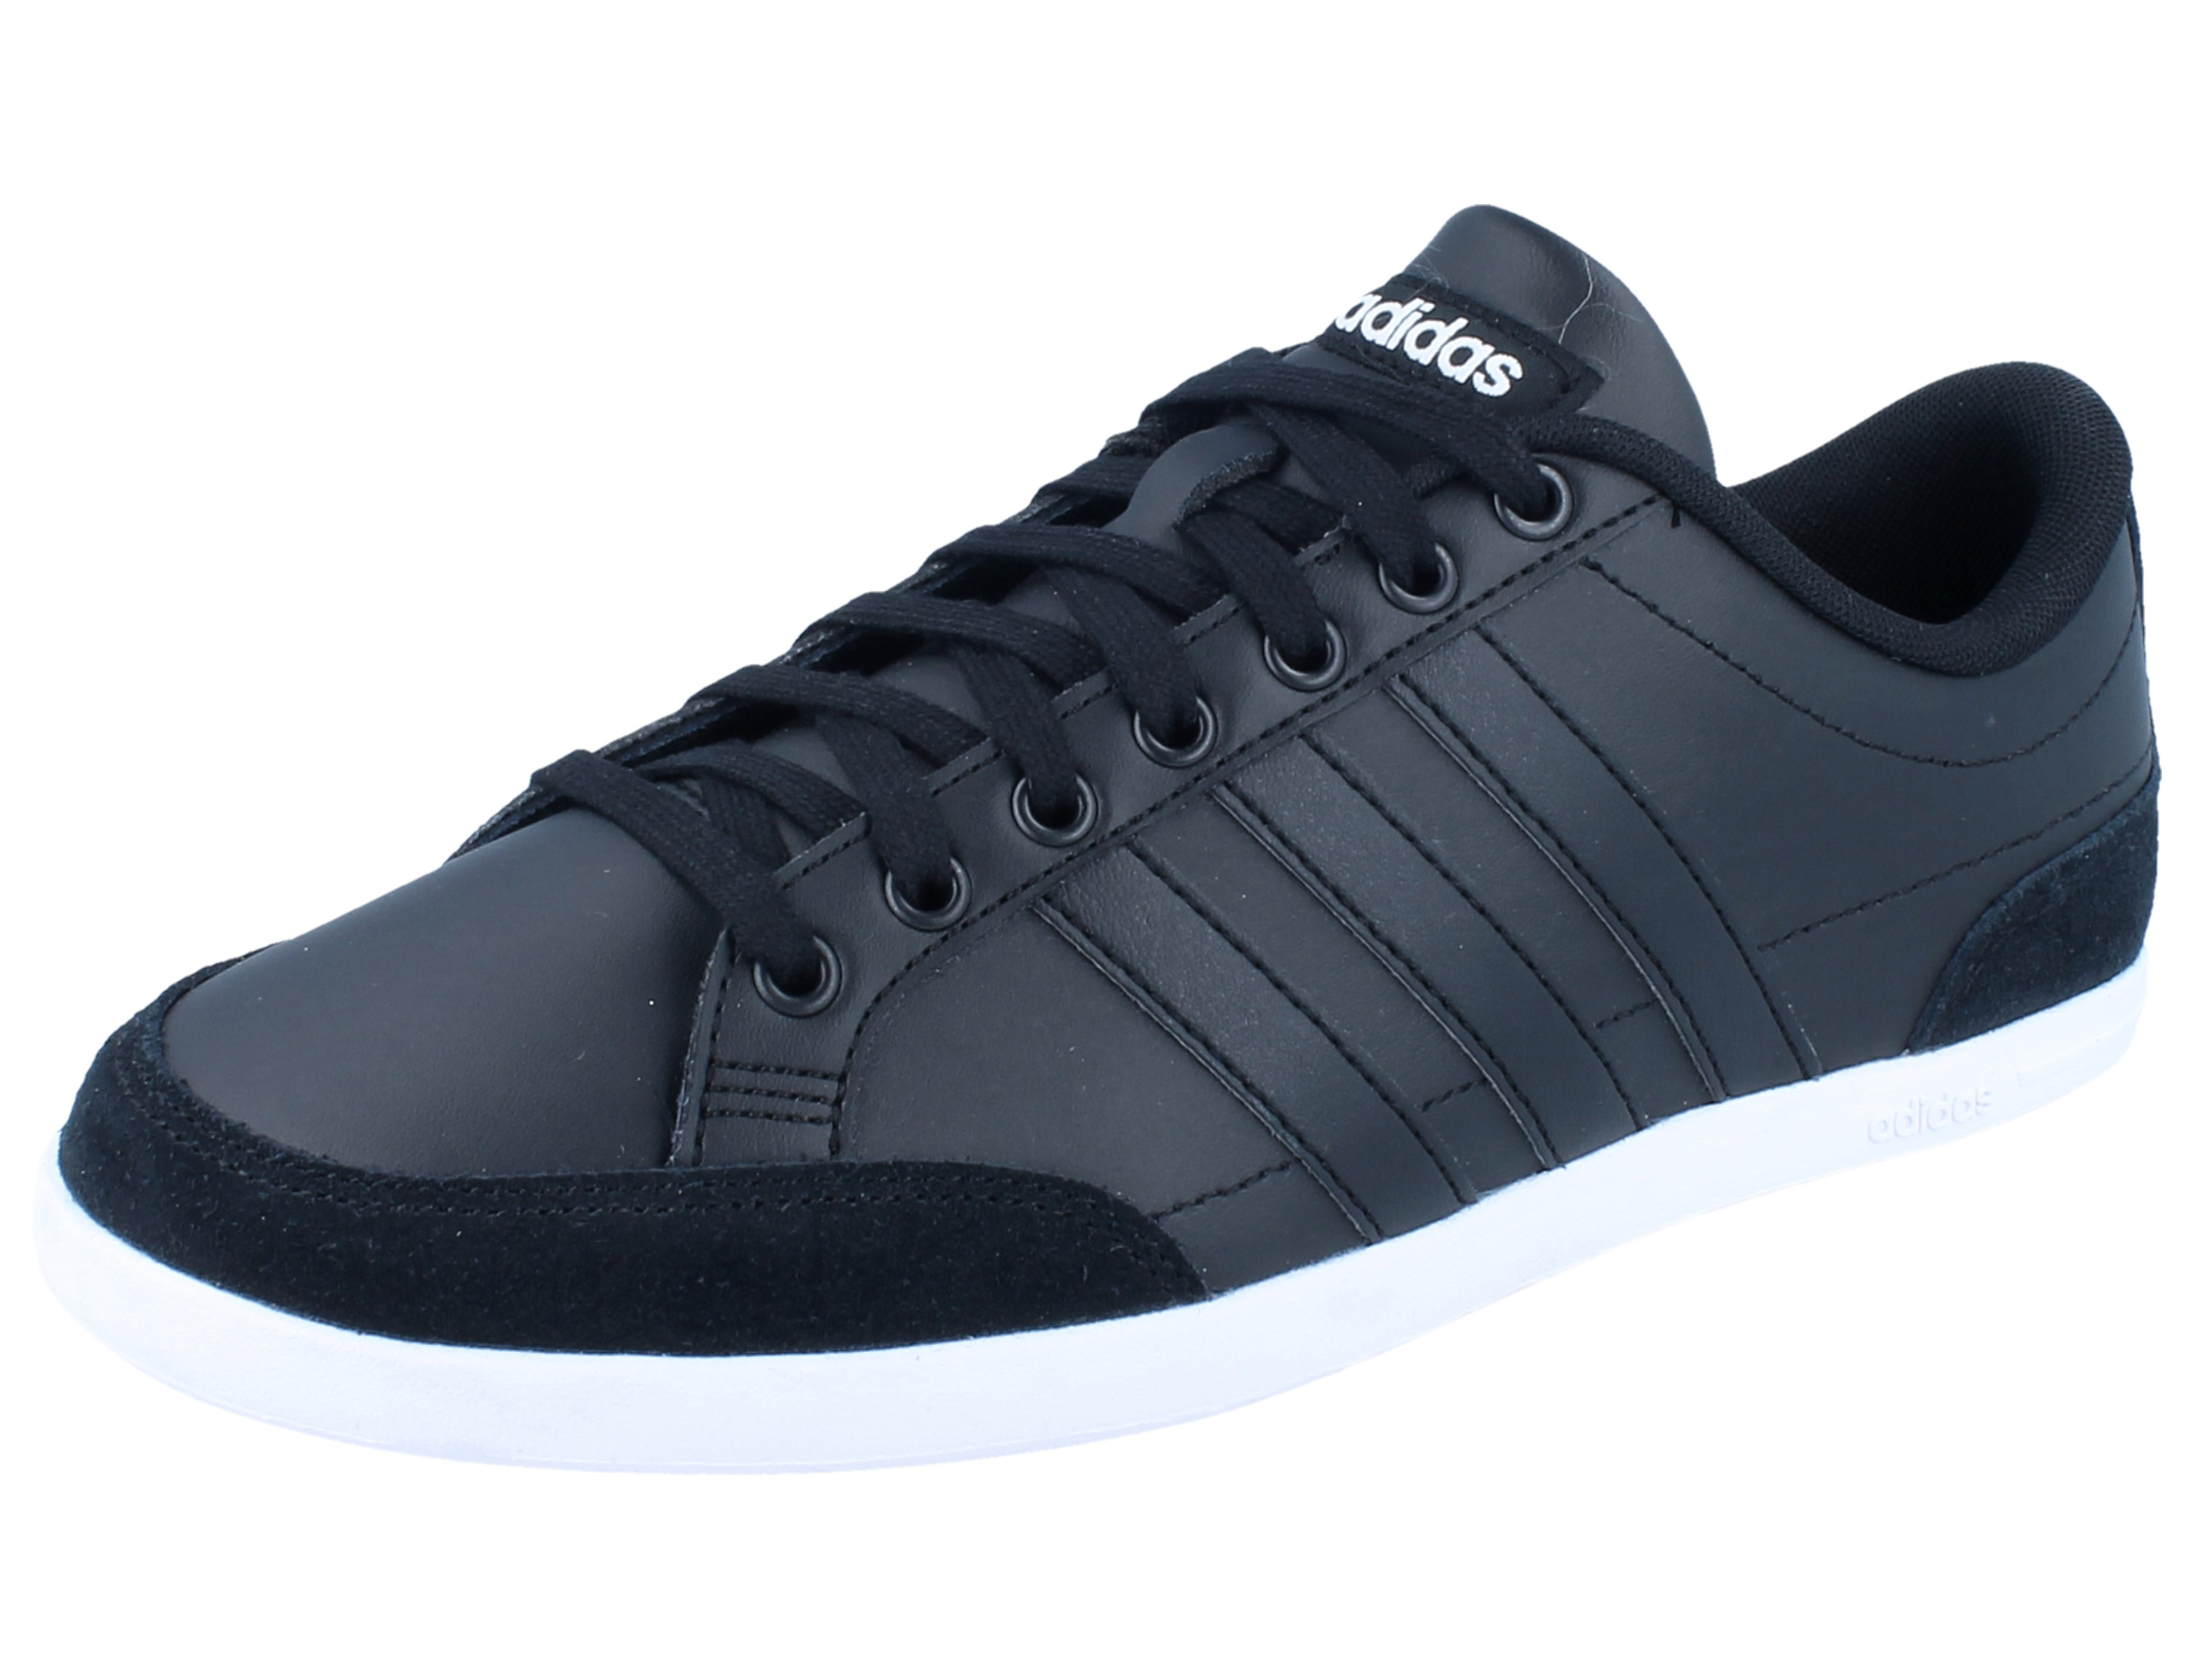 ADIDAS Caflaire black Leder